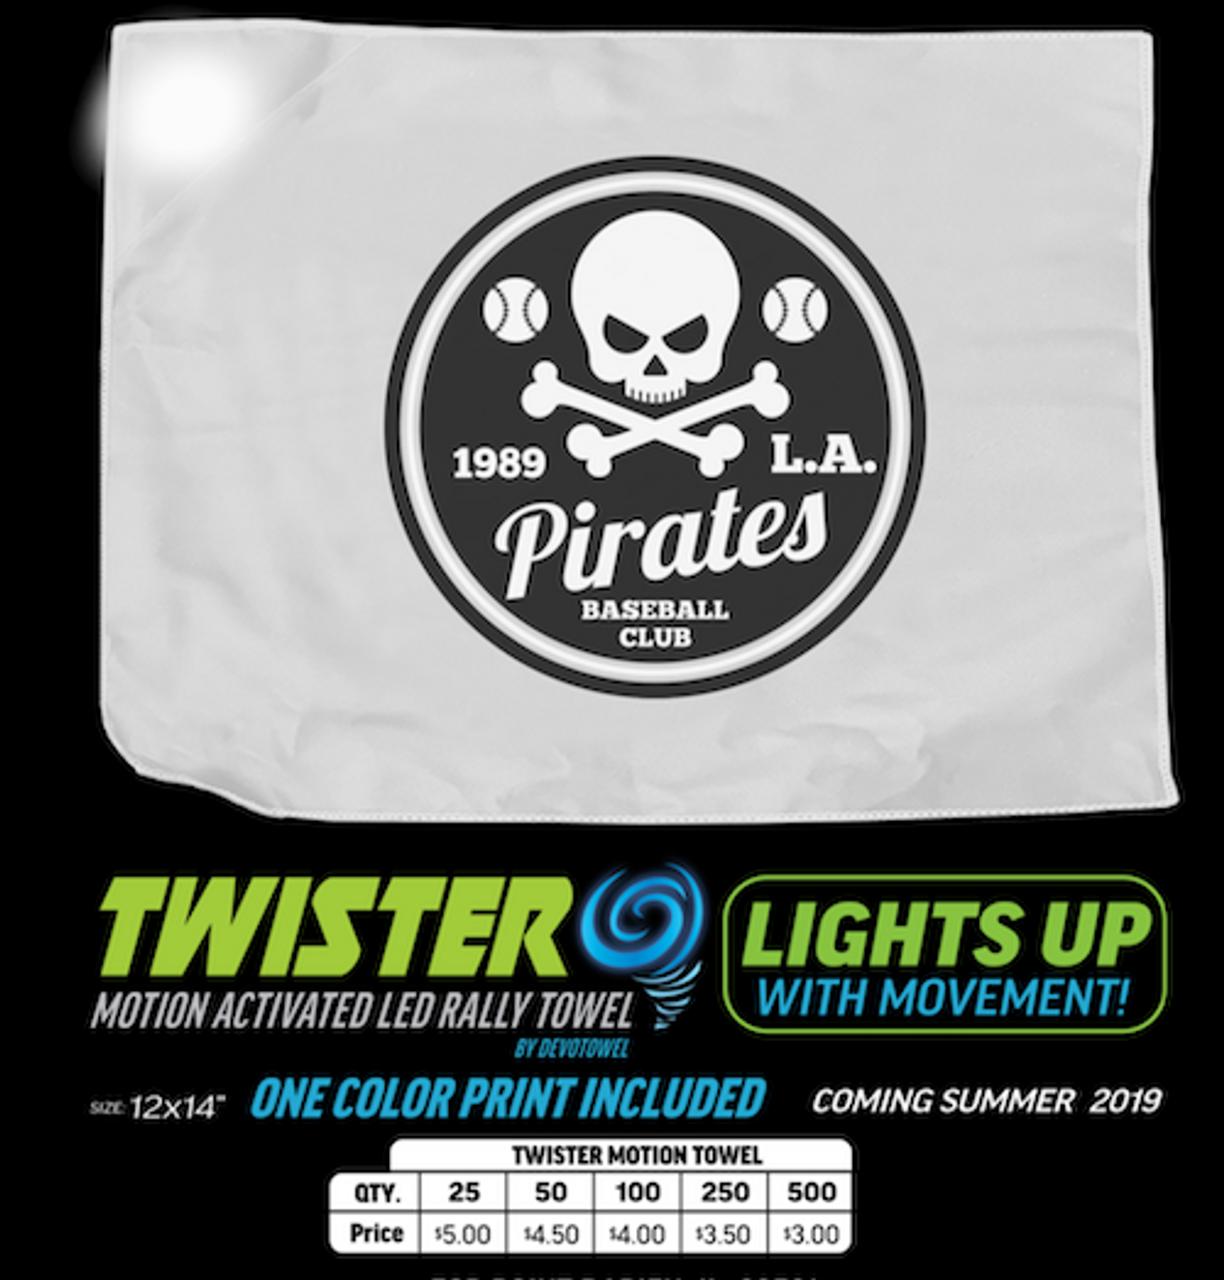 Sport, Cheer, event, promo, LED, light up, illuminated, rag, spirit, towel